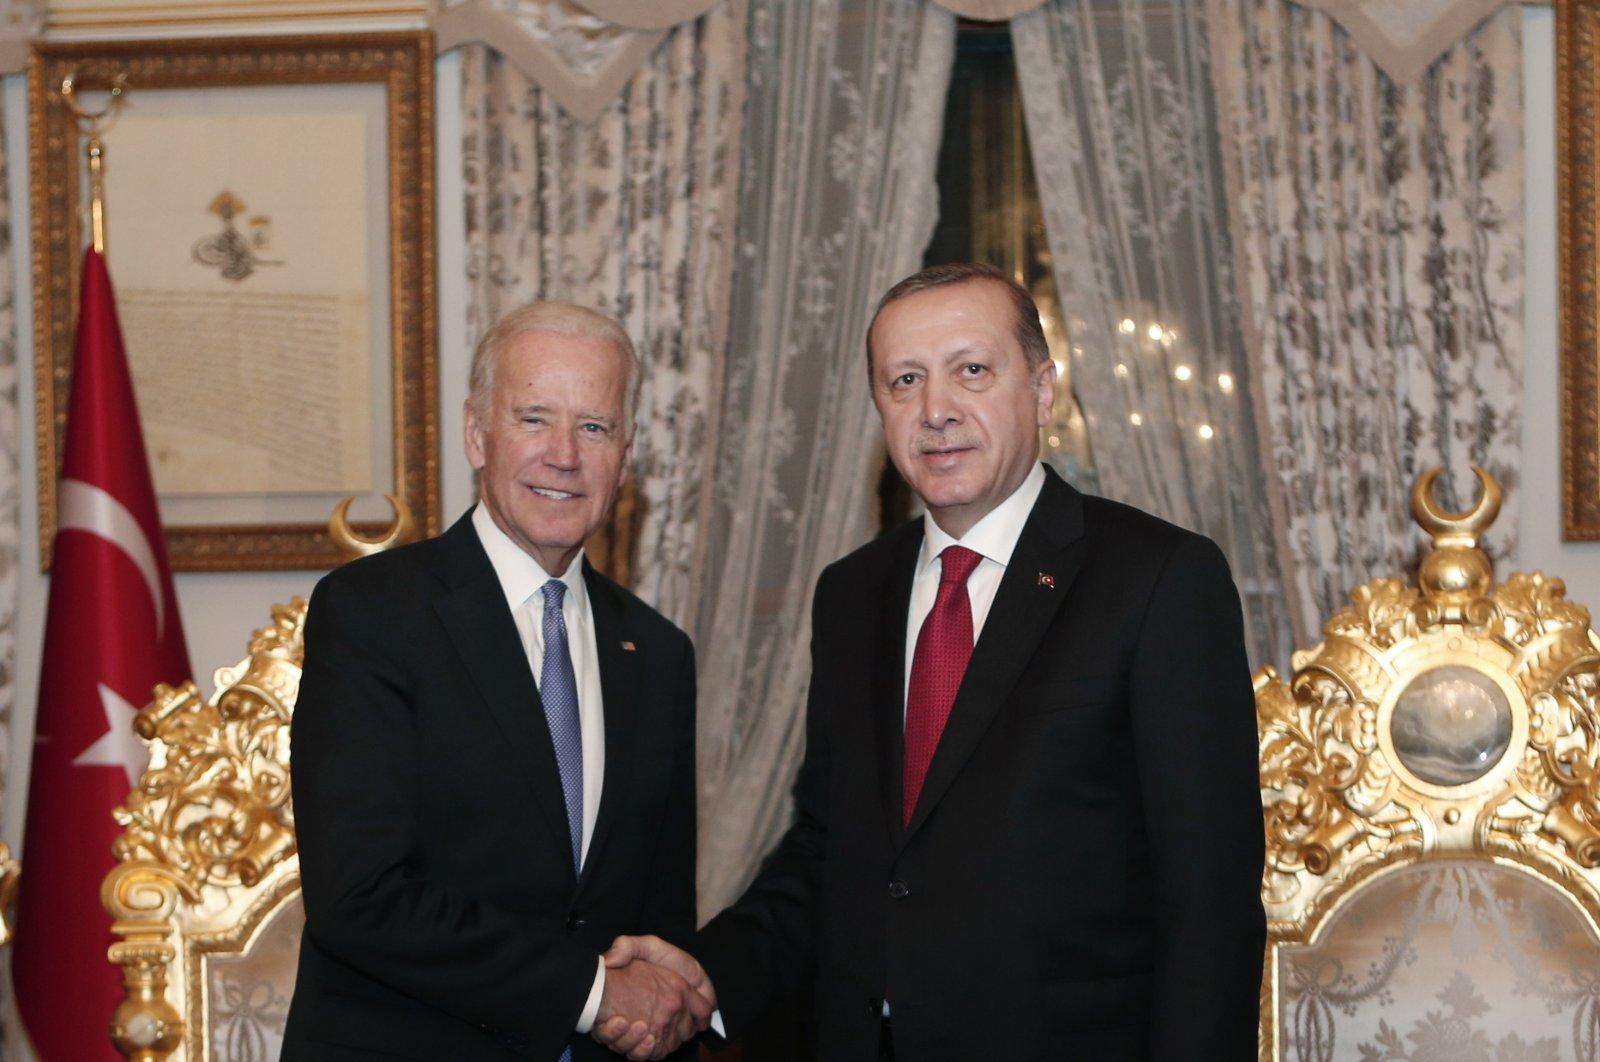 U.S. then-Vice President Joe Biden (L) poses with President Recep Tayyip Erdoğan (R) after a meeting in Istanbul, Turkey, Jan. 23, 2016. (EPA Photo)